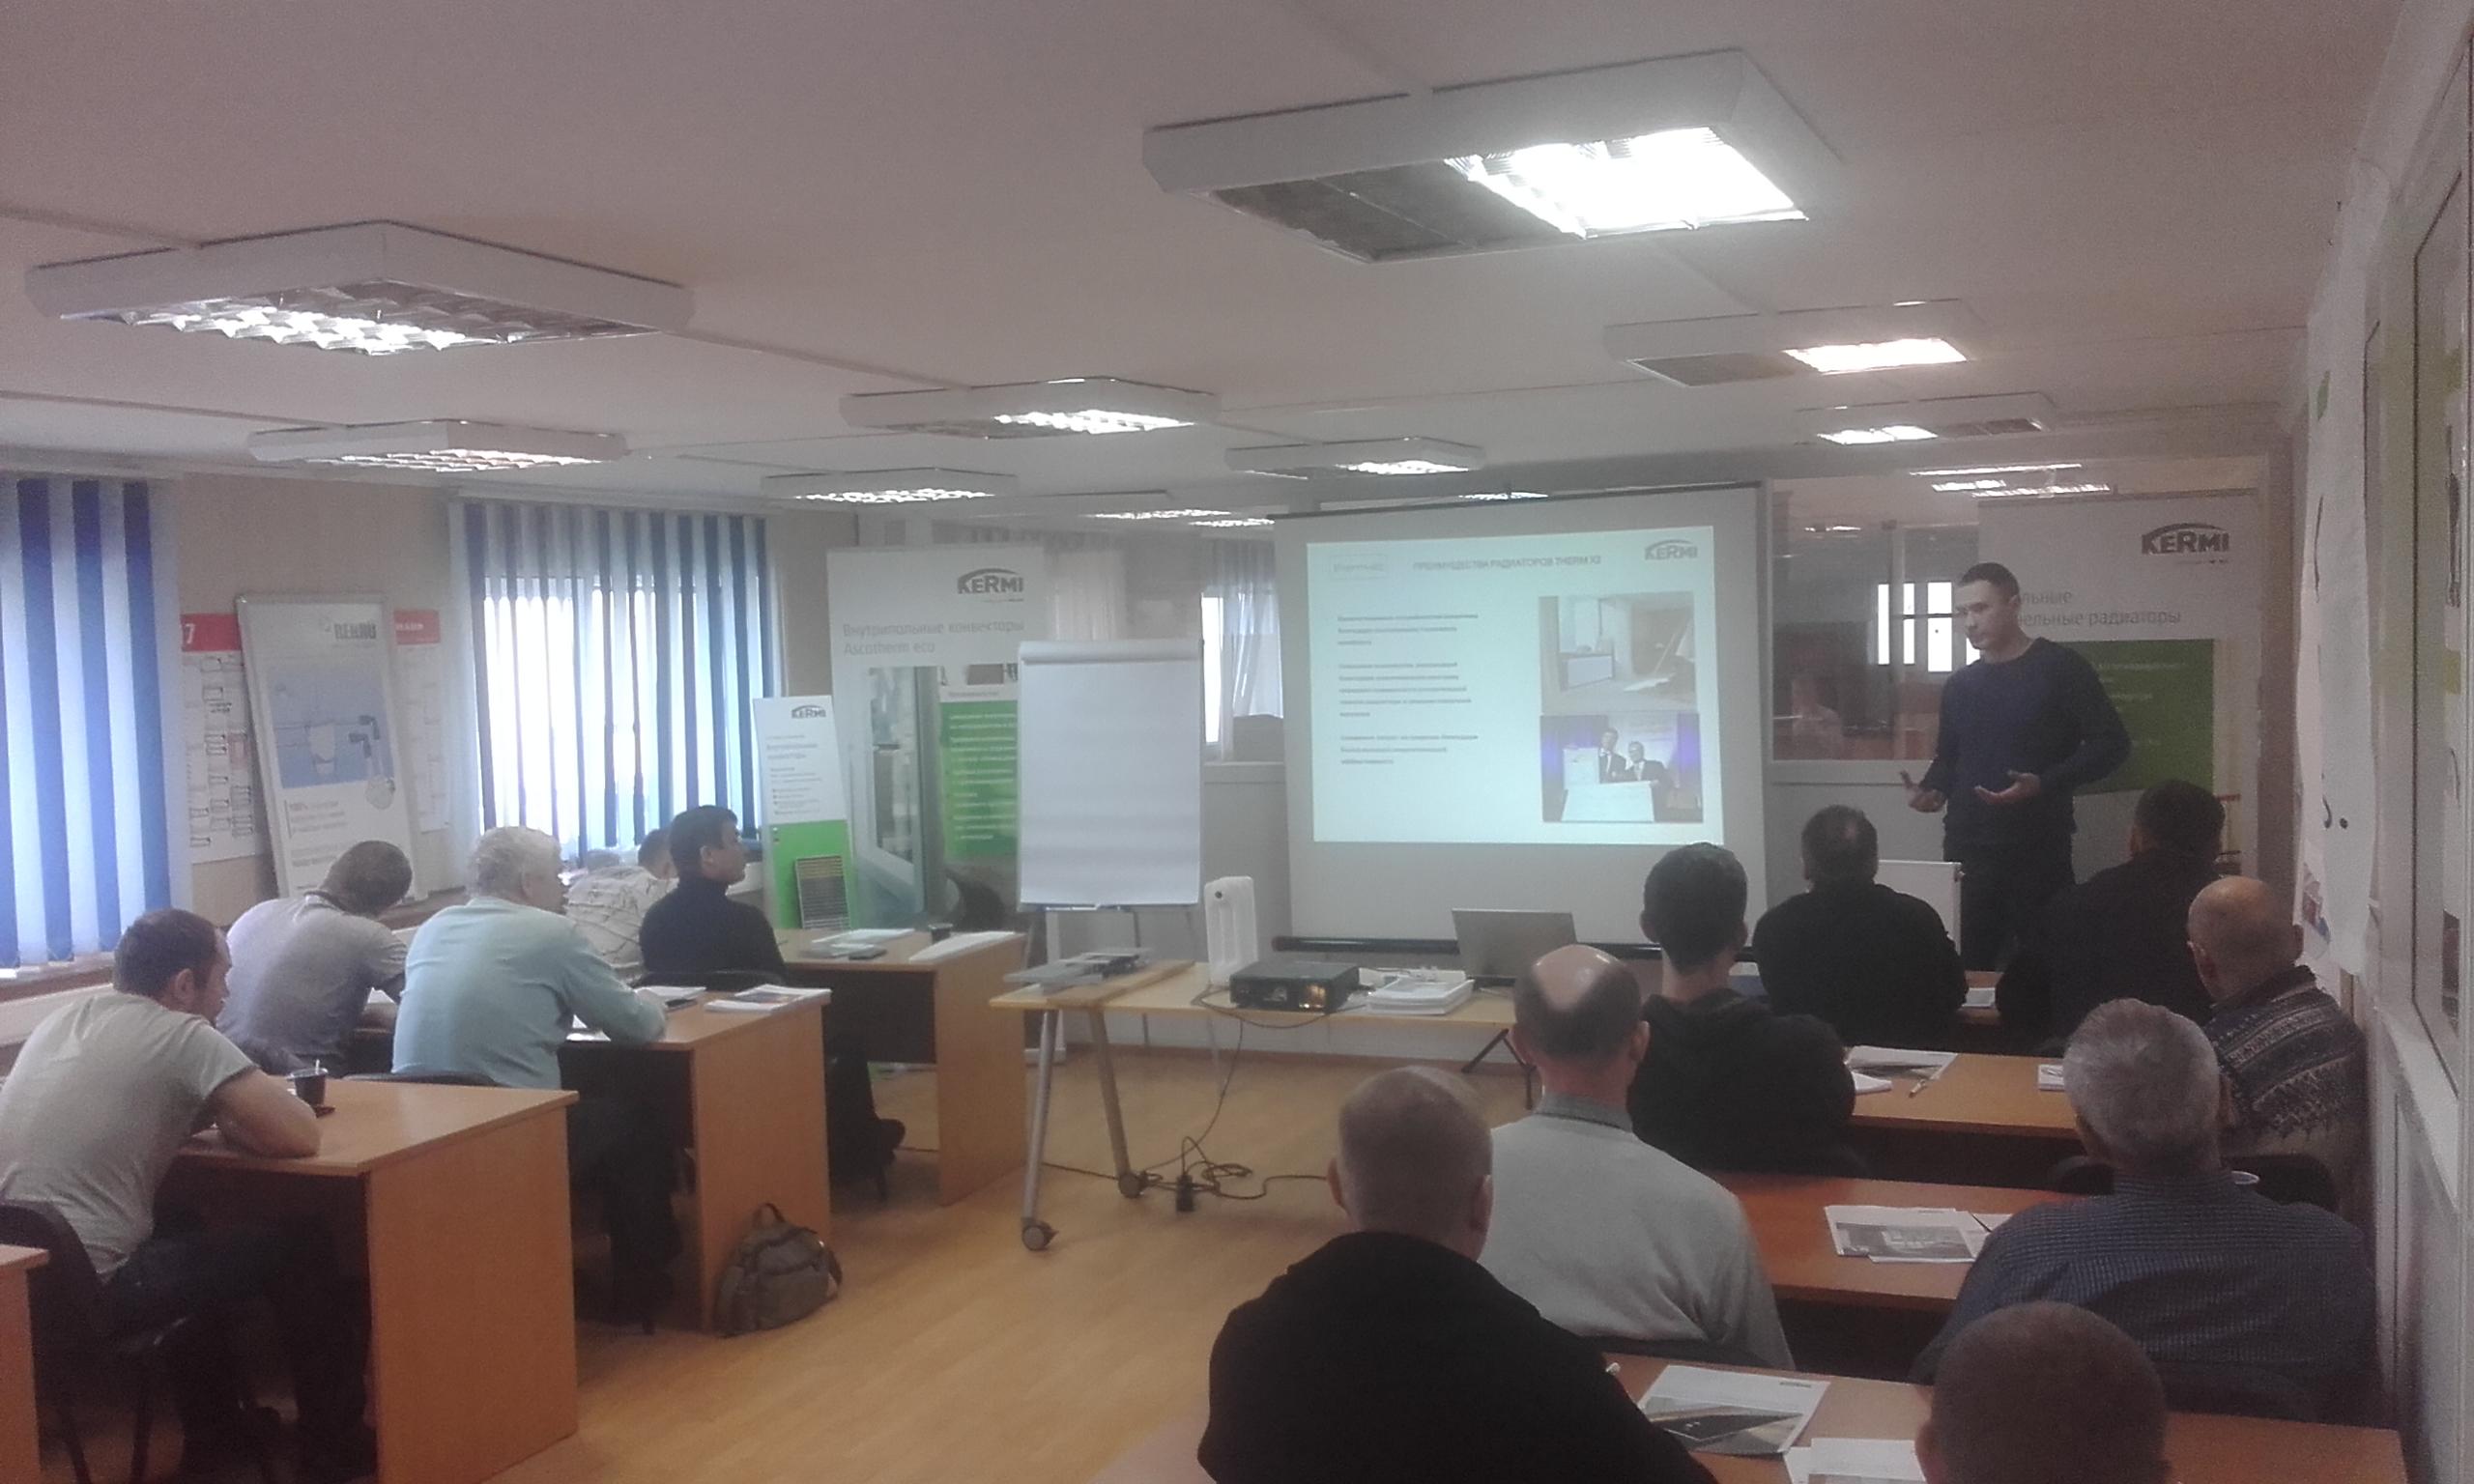 Фото с семинара Kermi, Arbonia, IMI Heimeier - 1